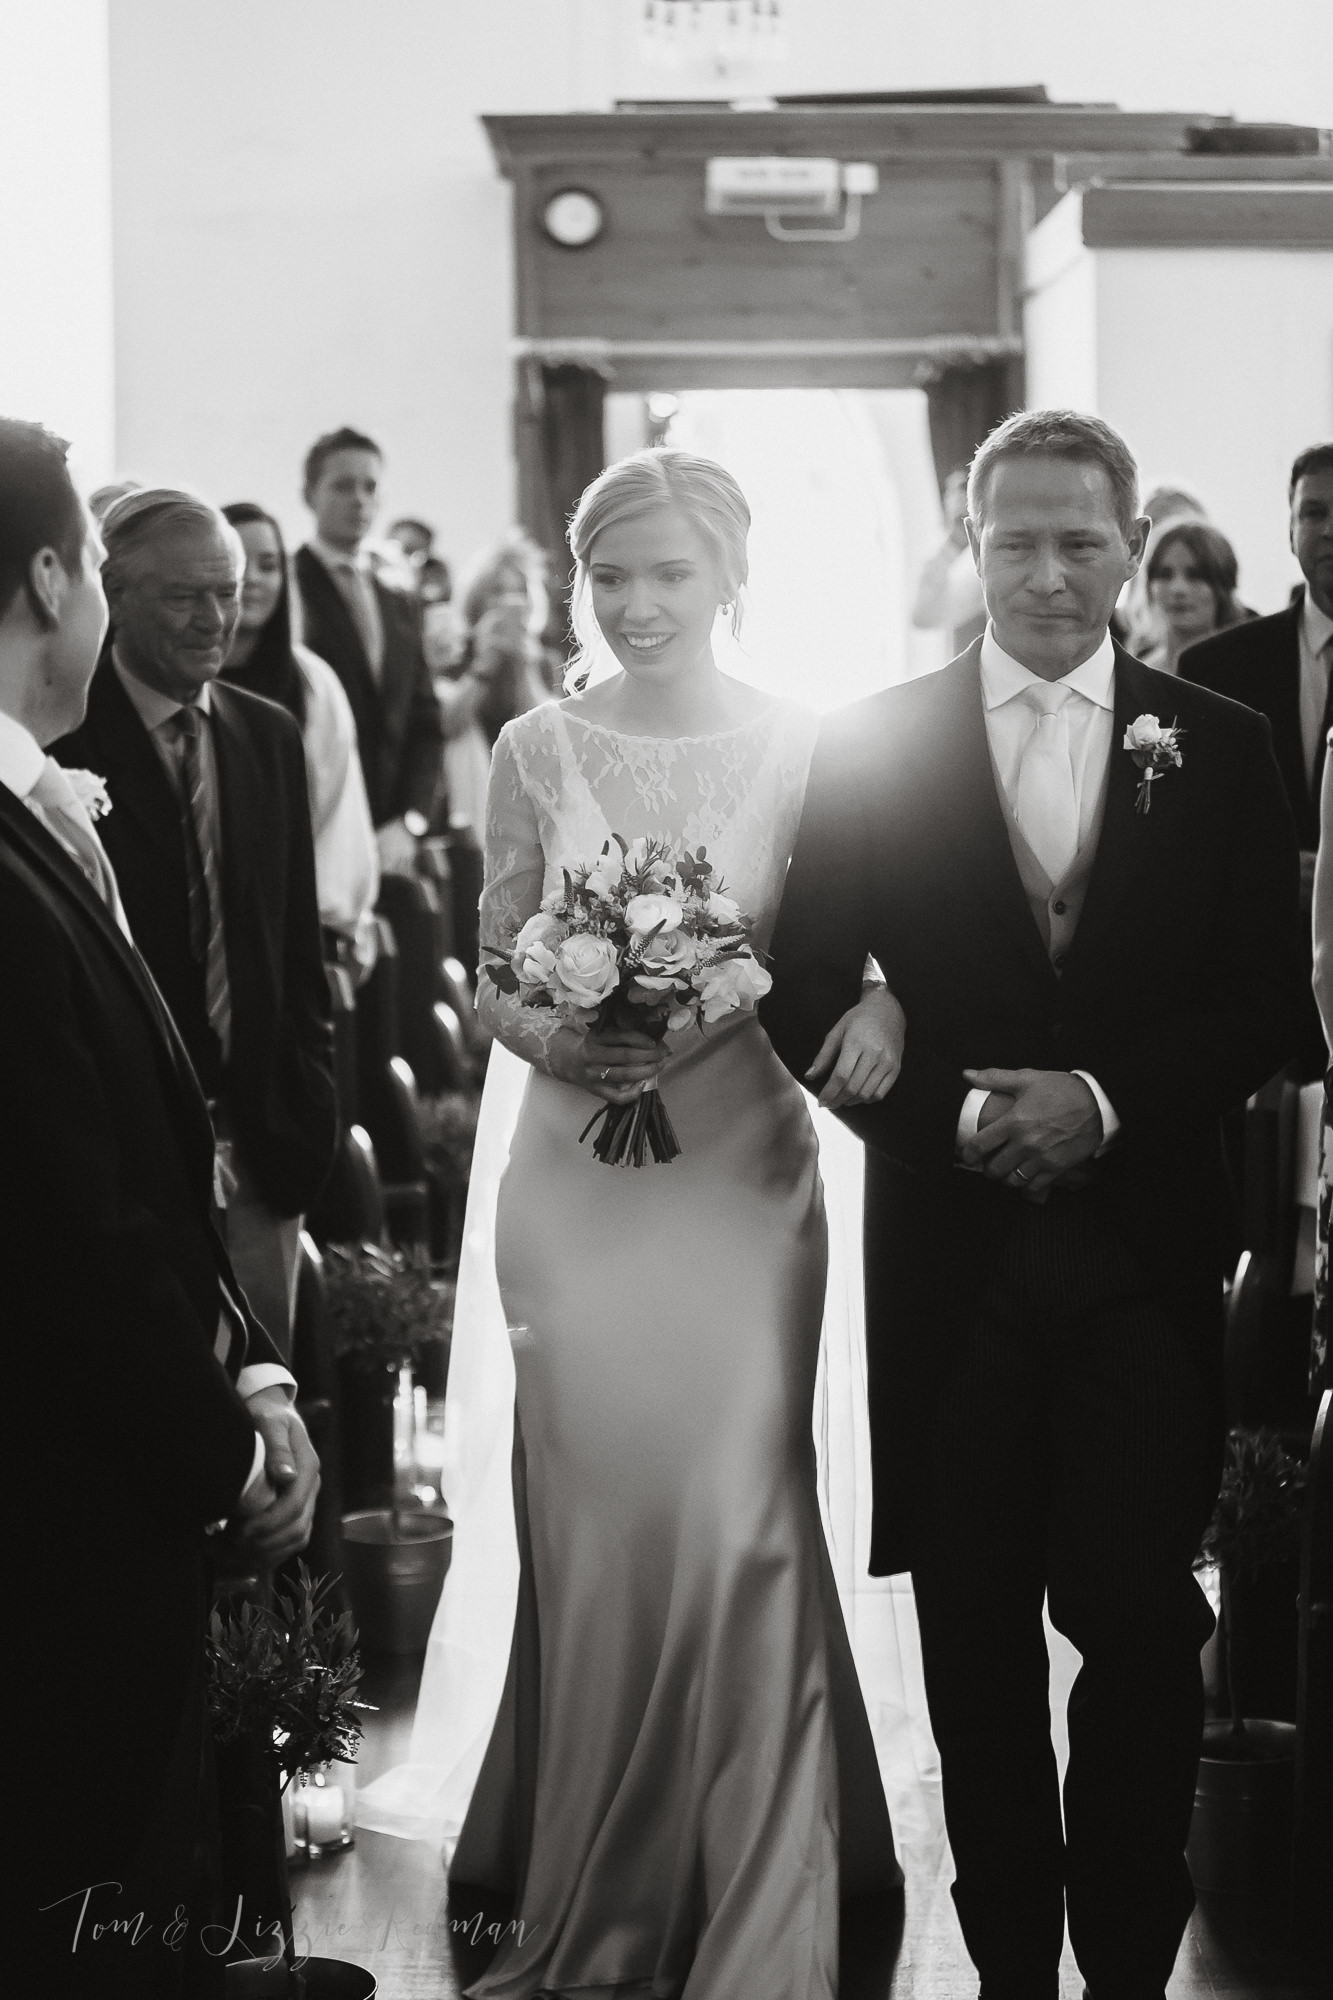 Dorset wedding photographers Tom & Lizzie Redman 017.jpg